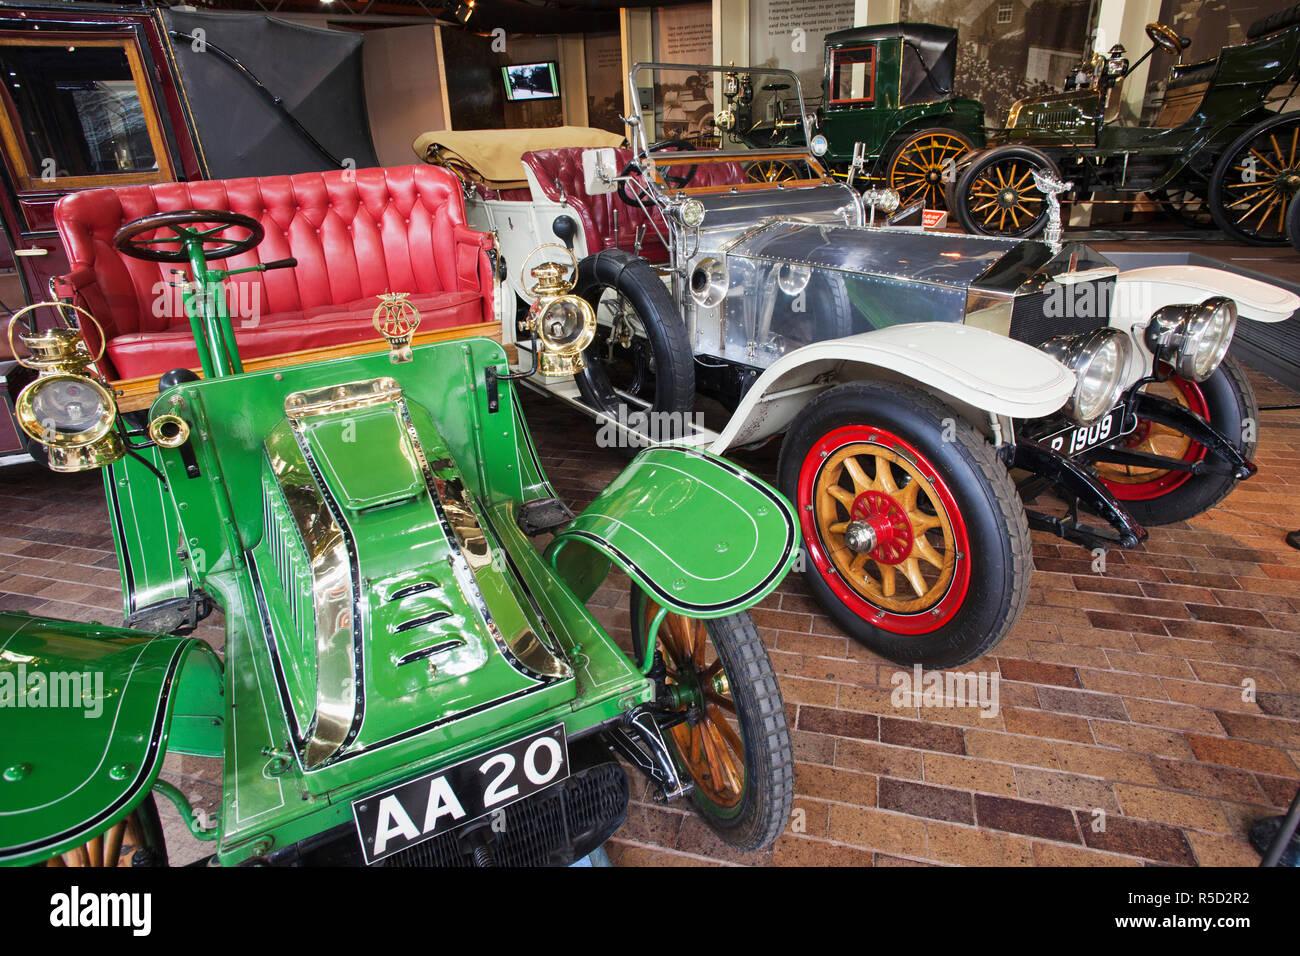 England, Hampshire, New Forest, Beaulieu, das National Motor Museum Stockbild